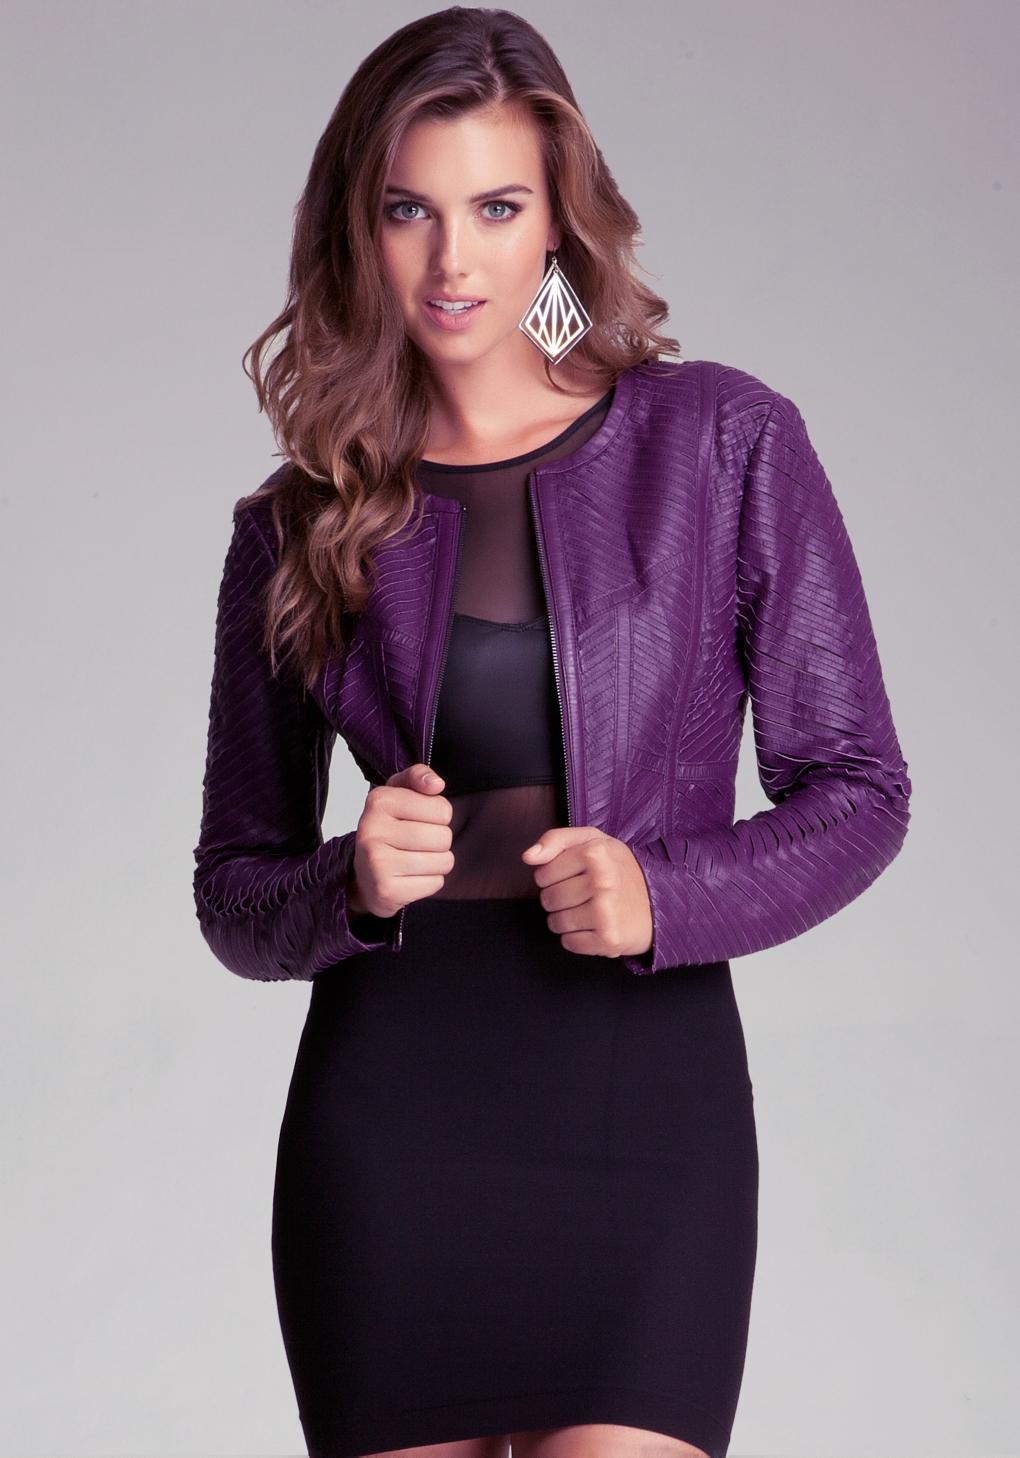 Bebe black leather jacket